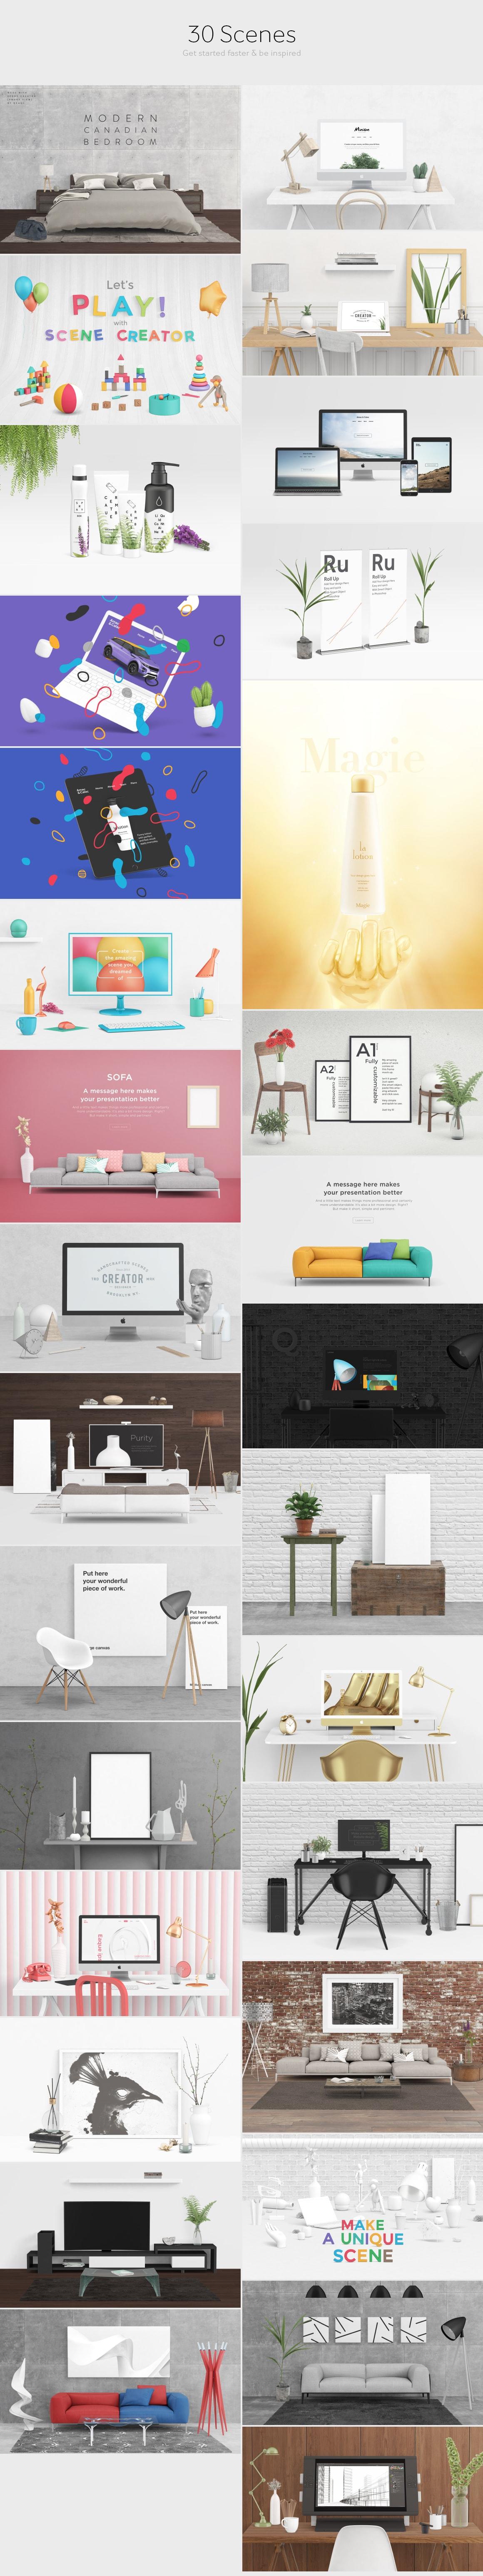 creative-market-scene-creator-bundle-30